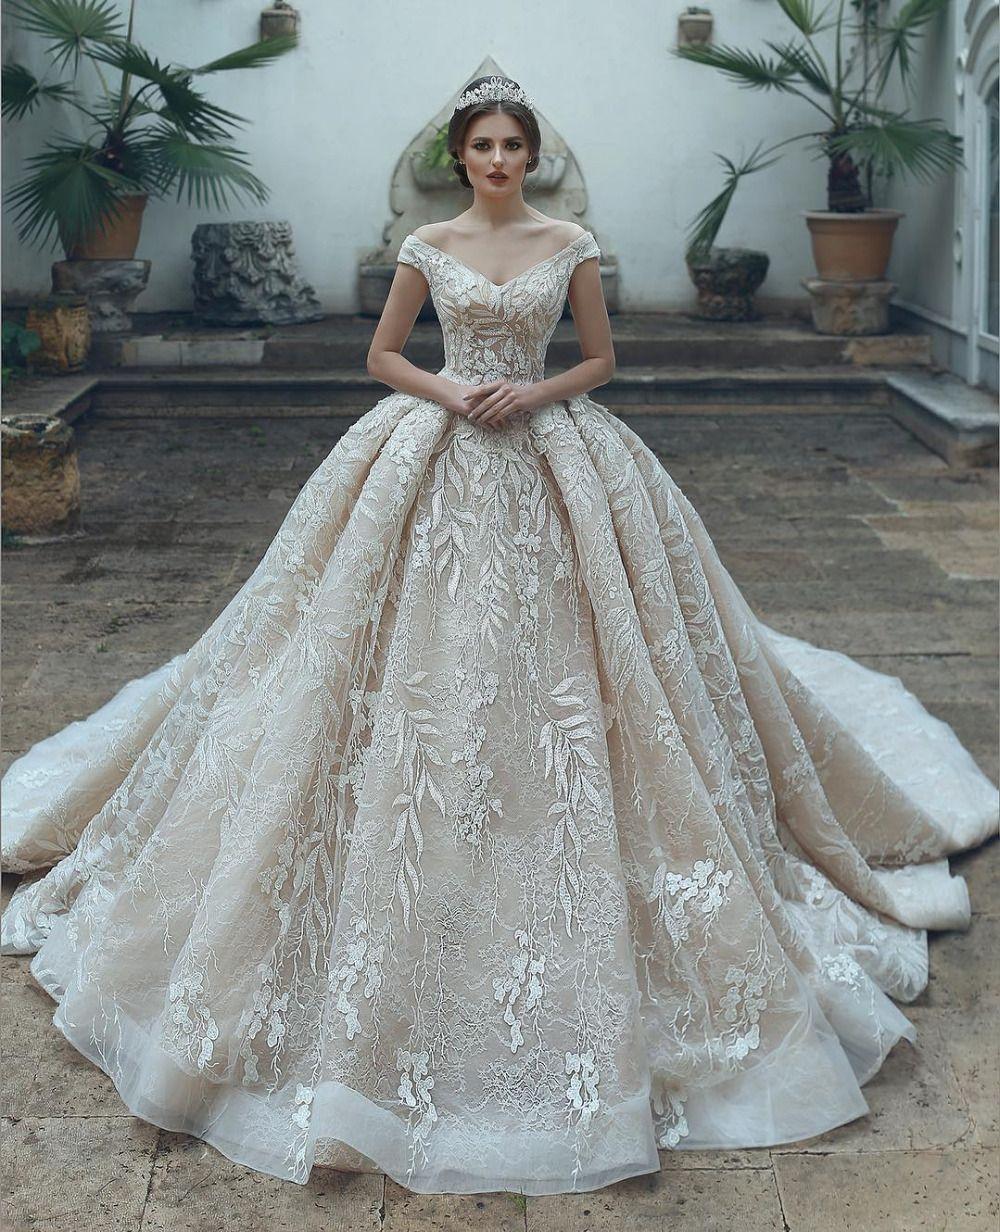 Big Wedding Ball Gowns: Luxurious Modern Full Lace Wedding Dresses 2019 Off